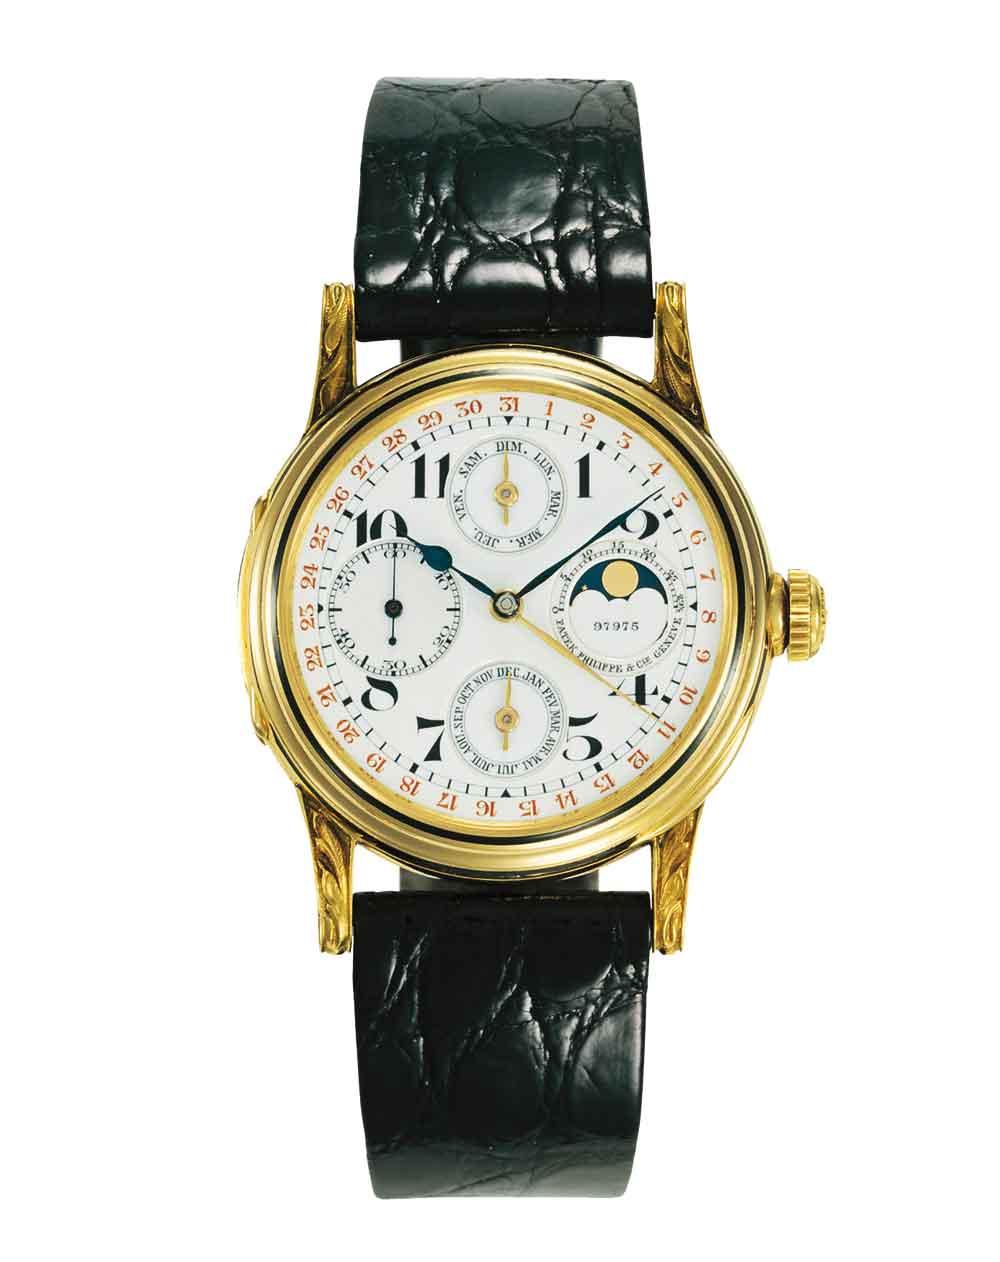 Primer reloj Patek Philippe calendario perpetuo